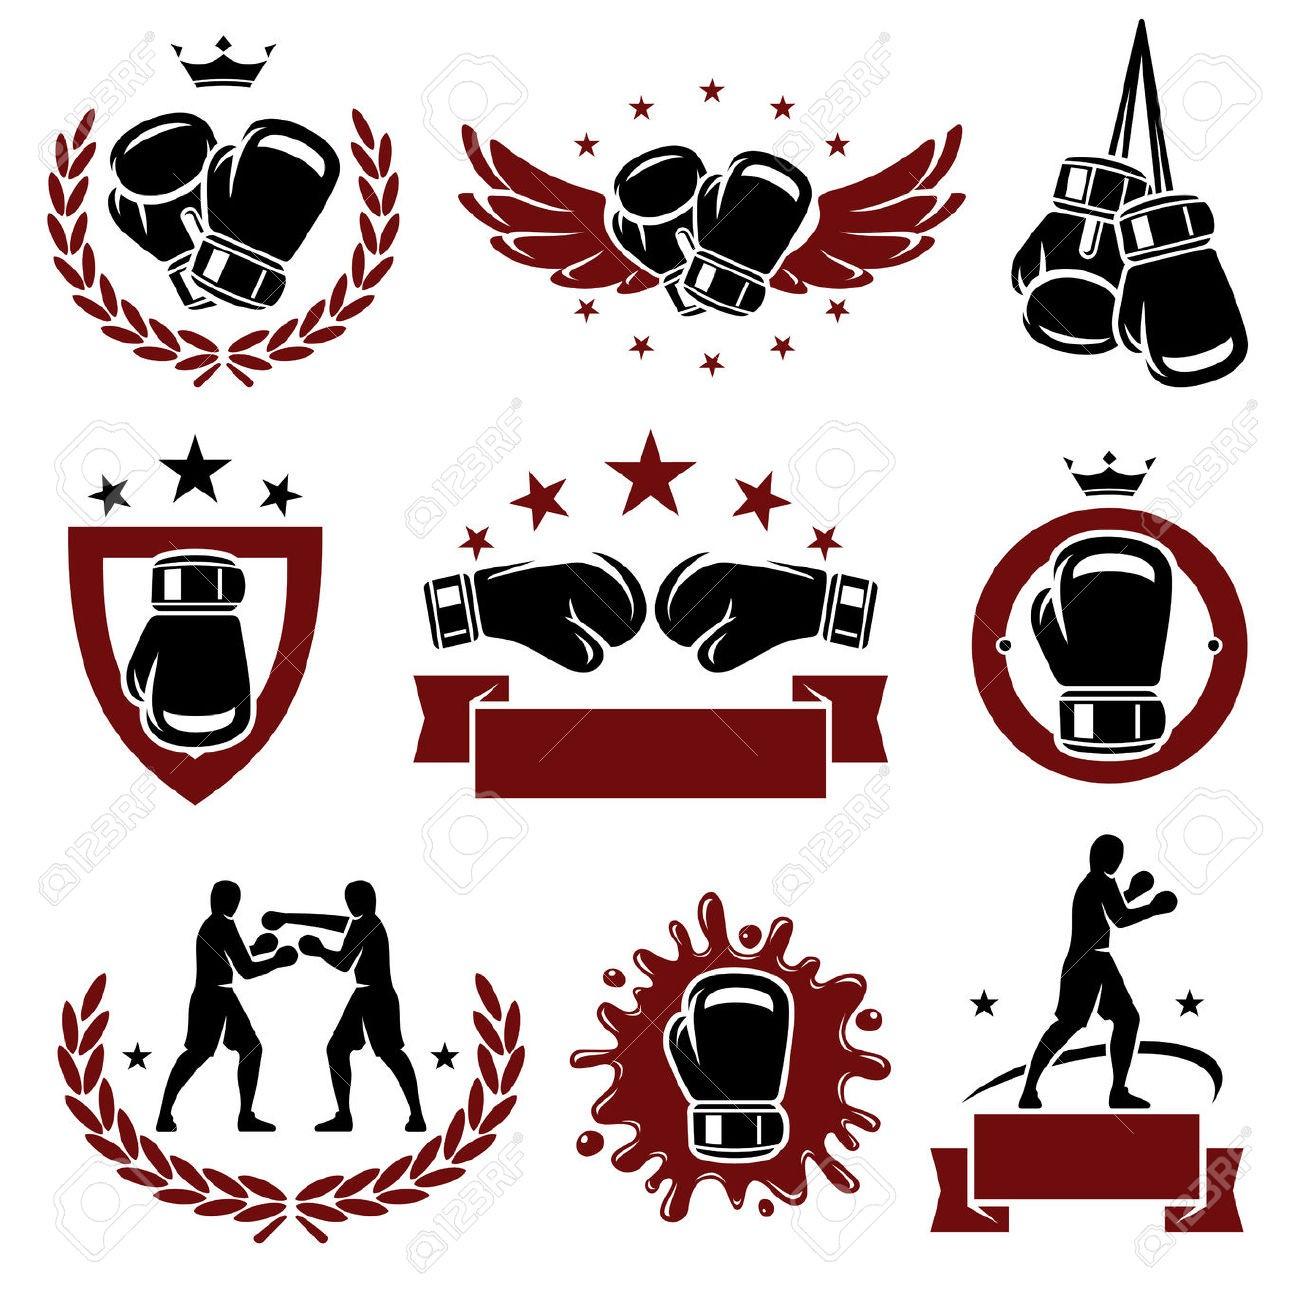 Glove drawing at getdrawings. Boxing clipart symbol